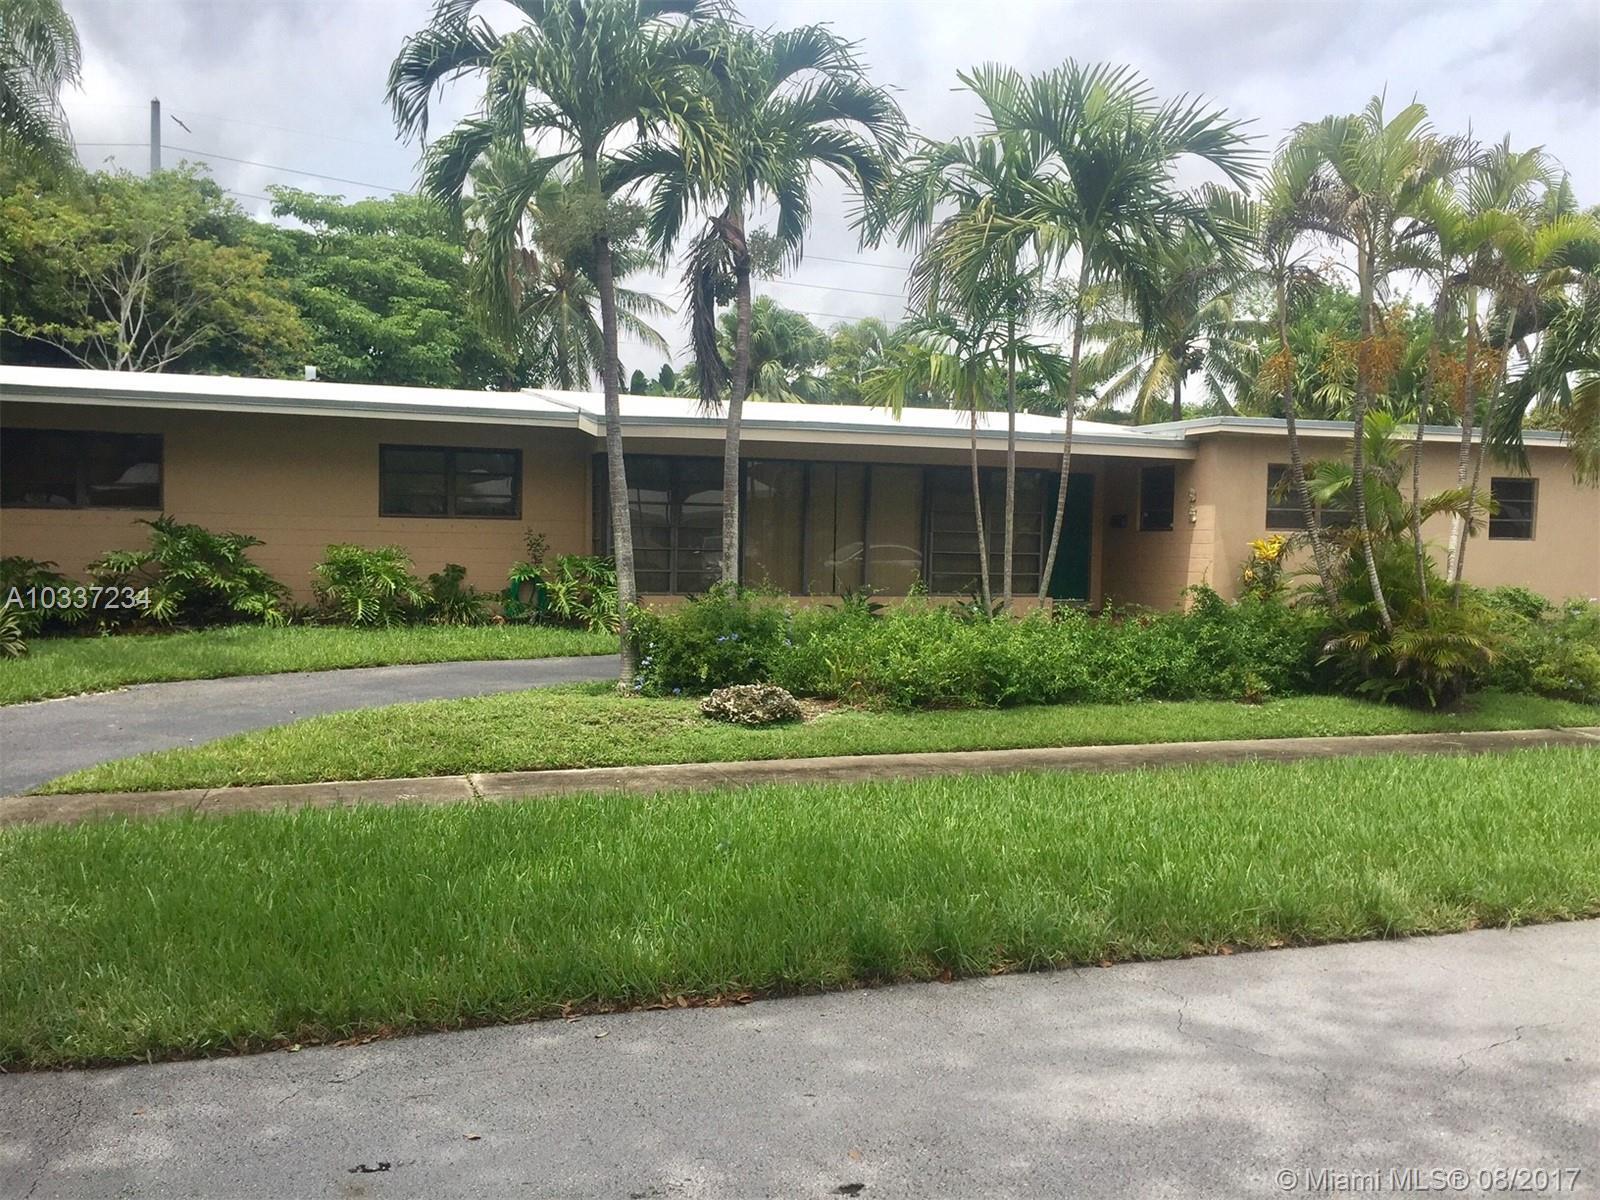 9250 SW 81st Ave, Miami , FL 33156